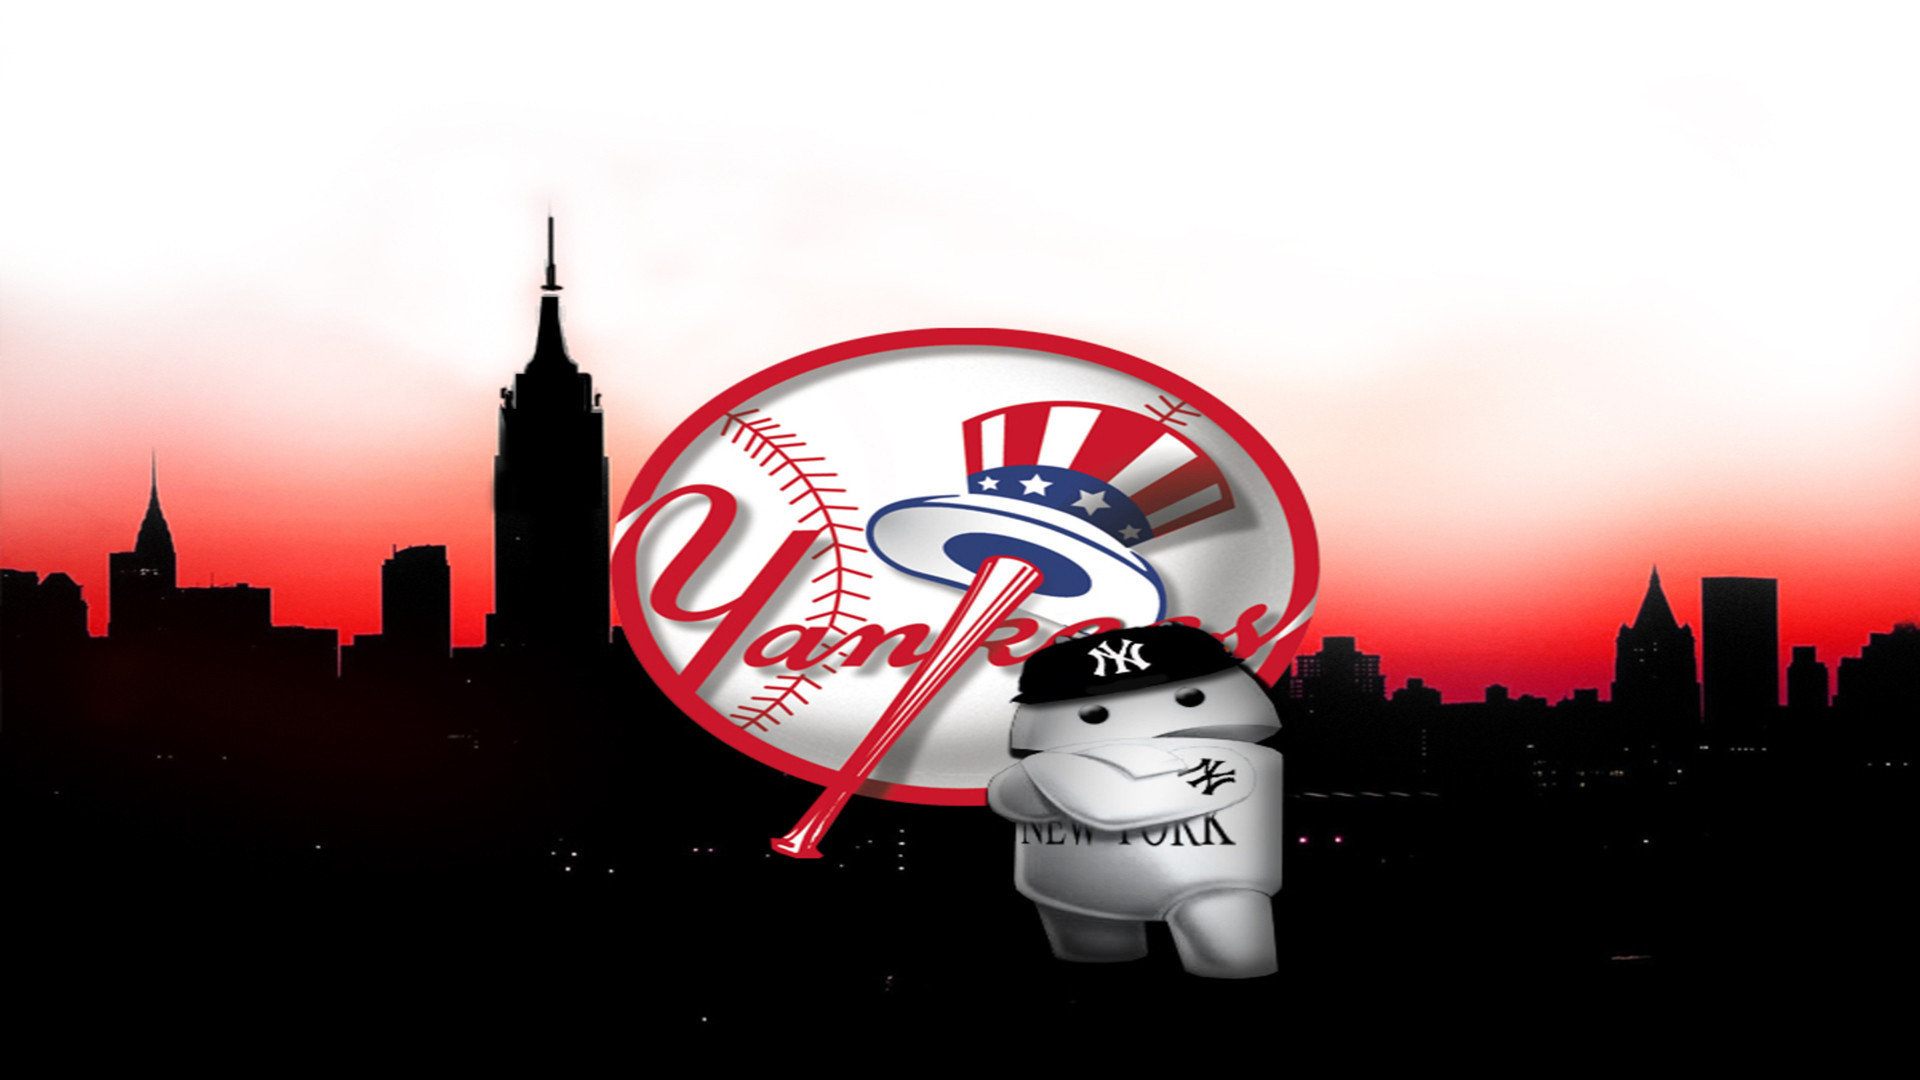 New York Yankees Wallpaper Hd - Yankees New York Wallpapers Hd , HD Wallpaper & Backgrounds